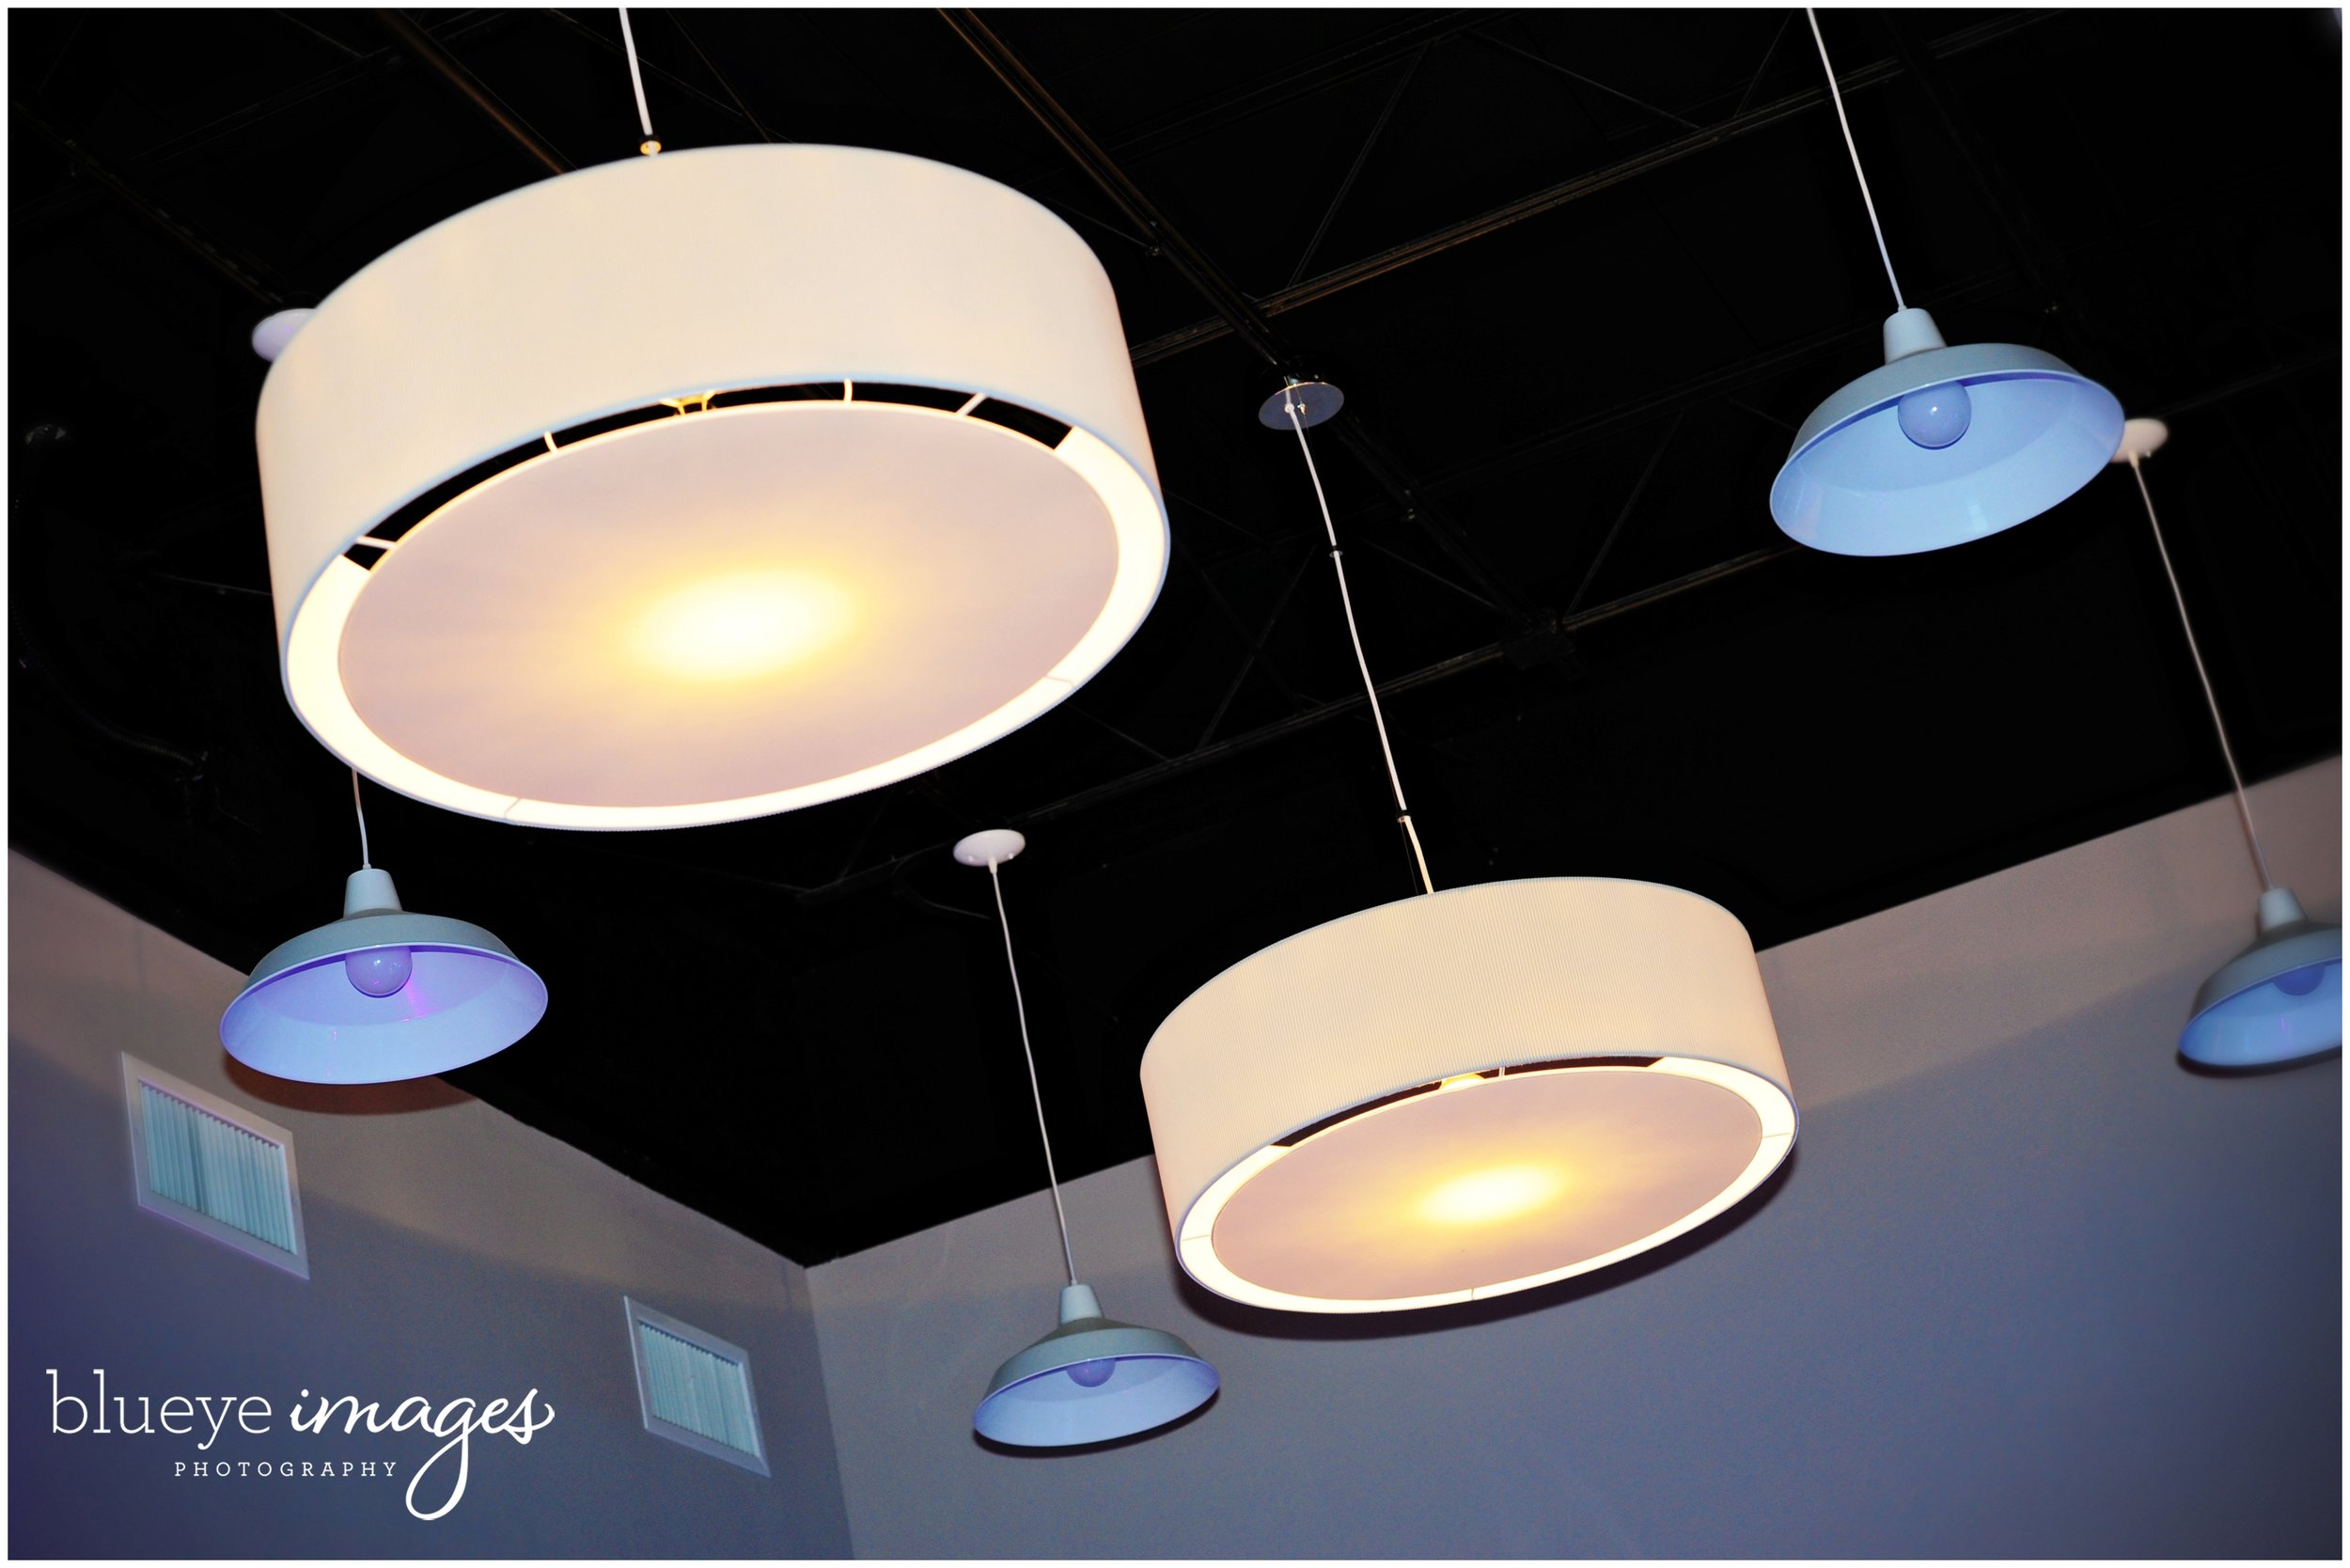 blueyeimages_aqua_sidebar0003_web.jpg